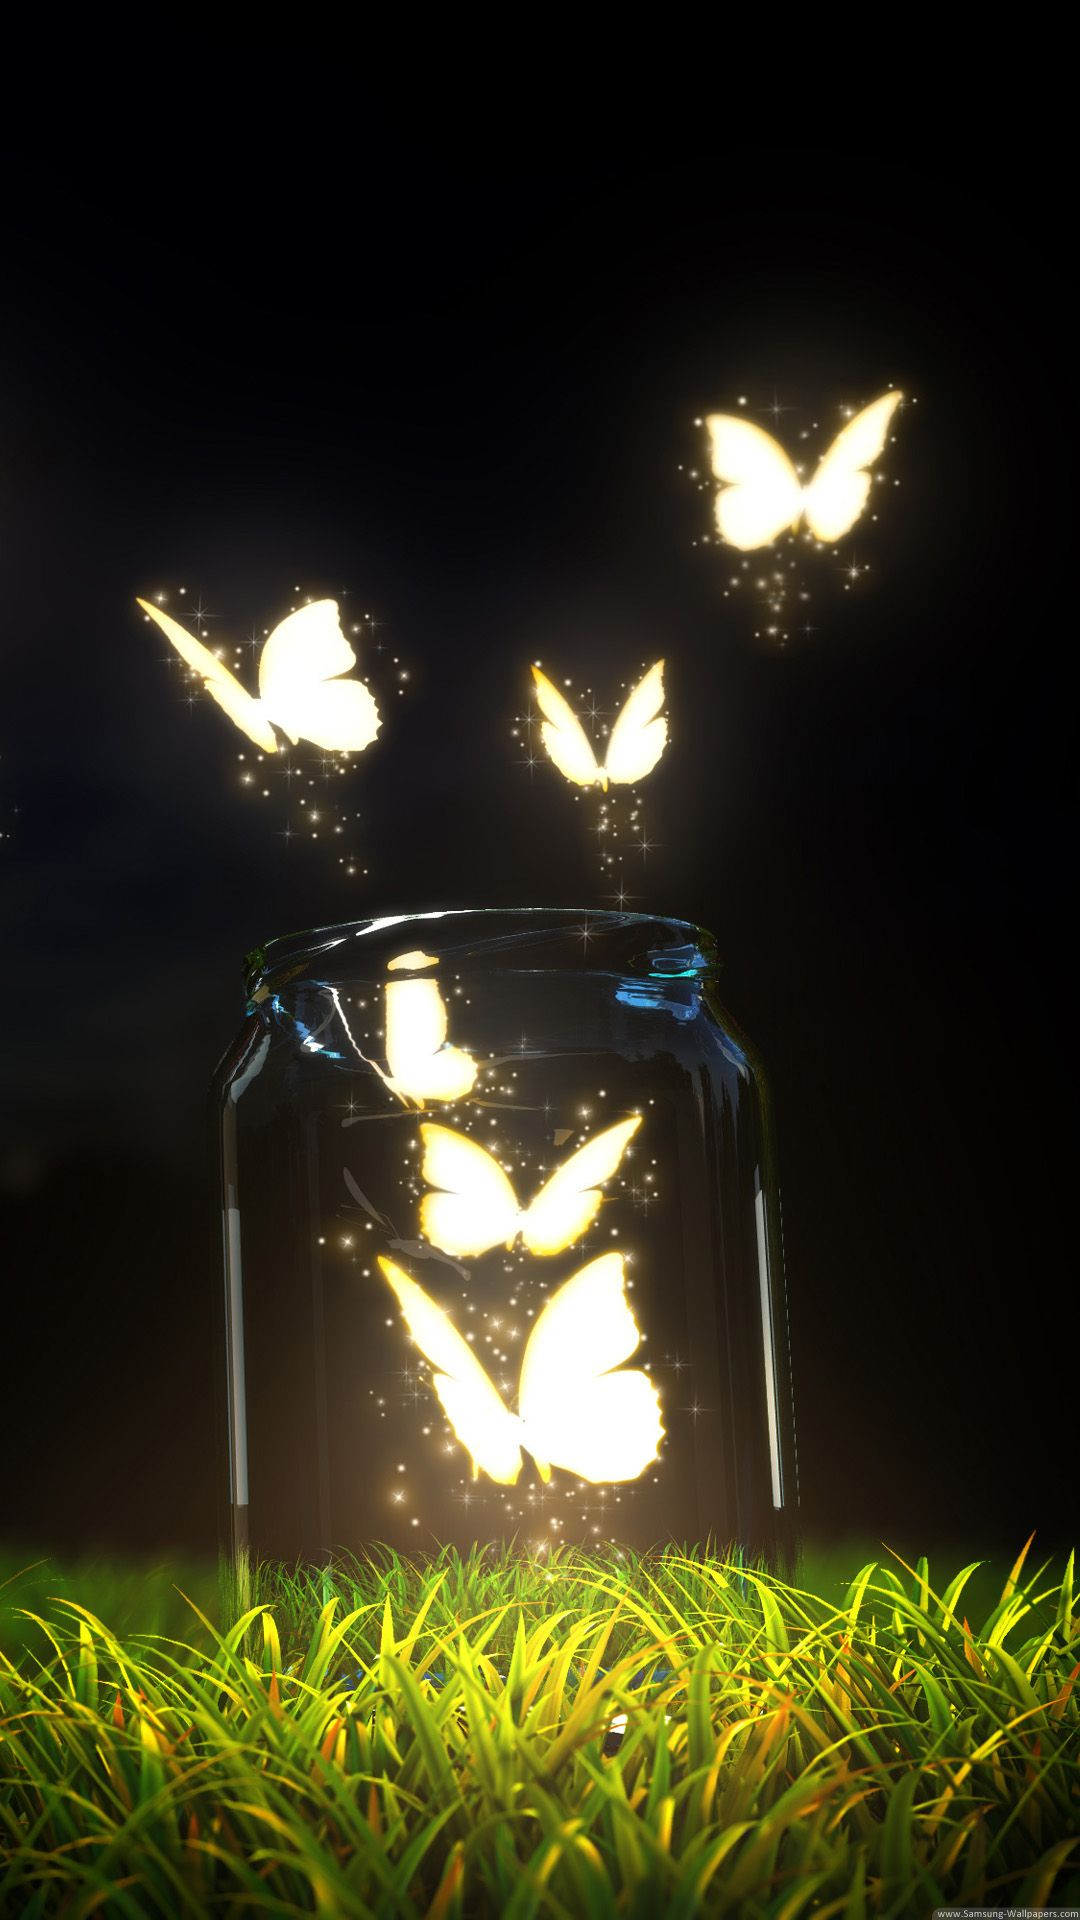 Wallpaper iphone rov - Fantasy Butterfly Jar Android Wallpaper